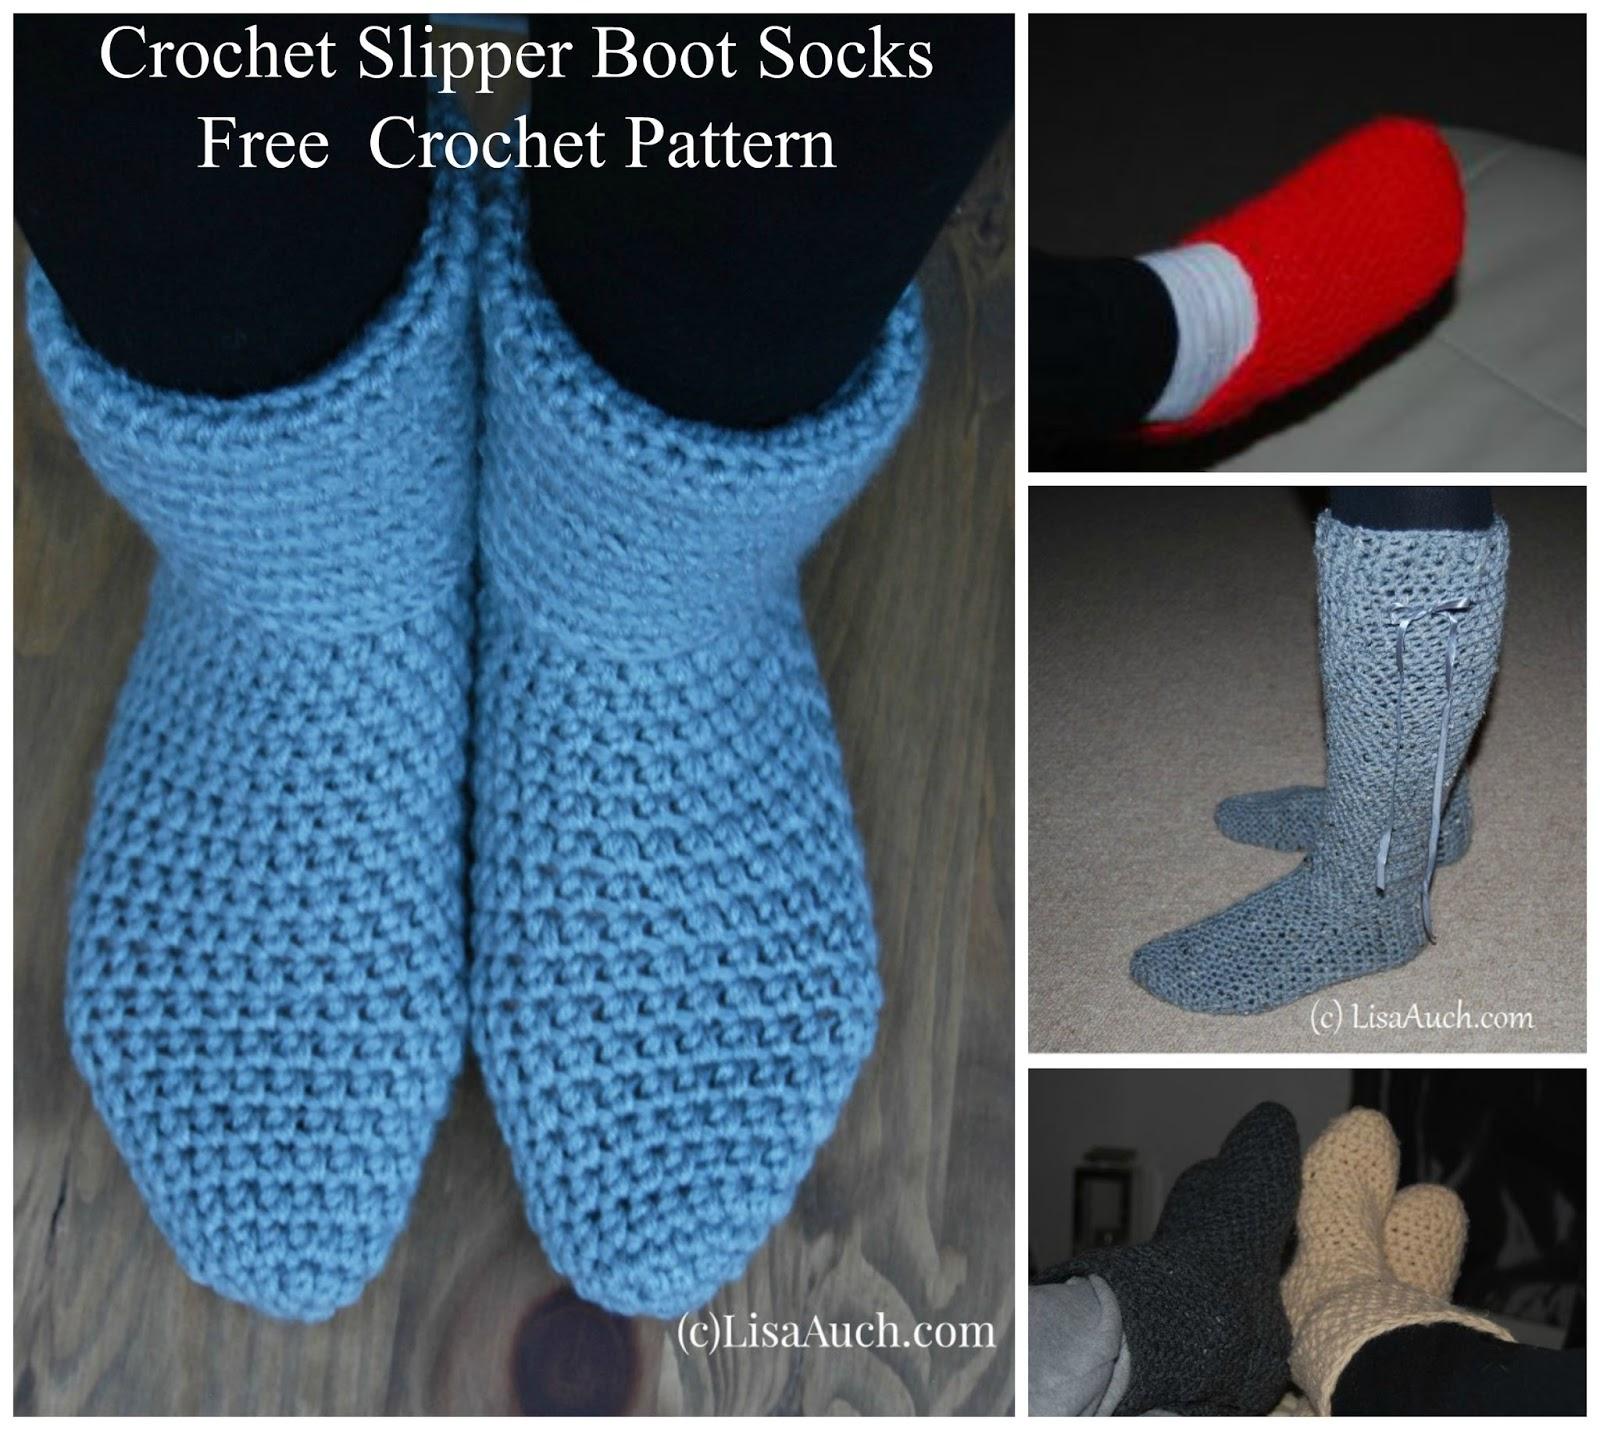 Crochet Slipper Boots A Free Crochet Pattern How To Crochet Slipper